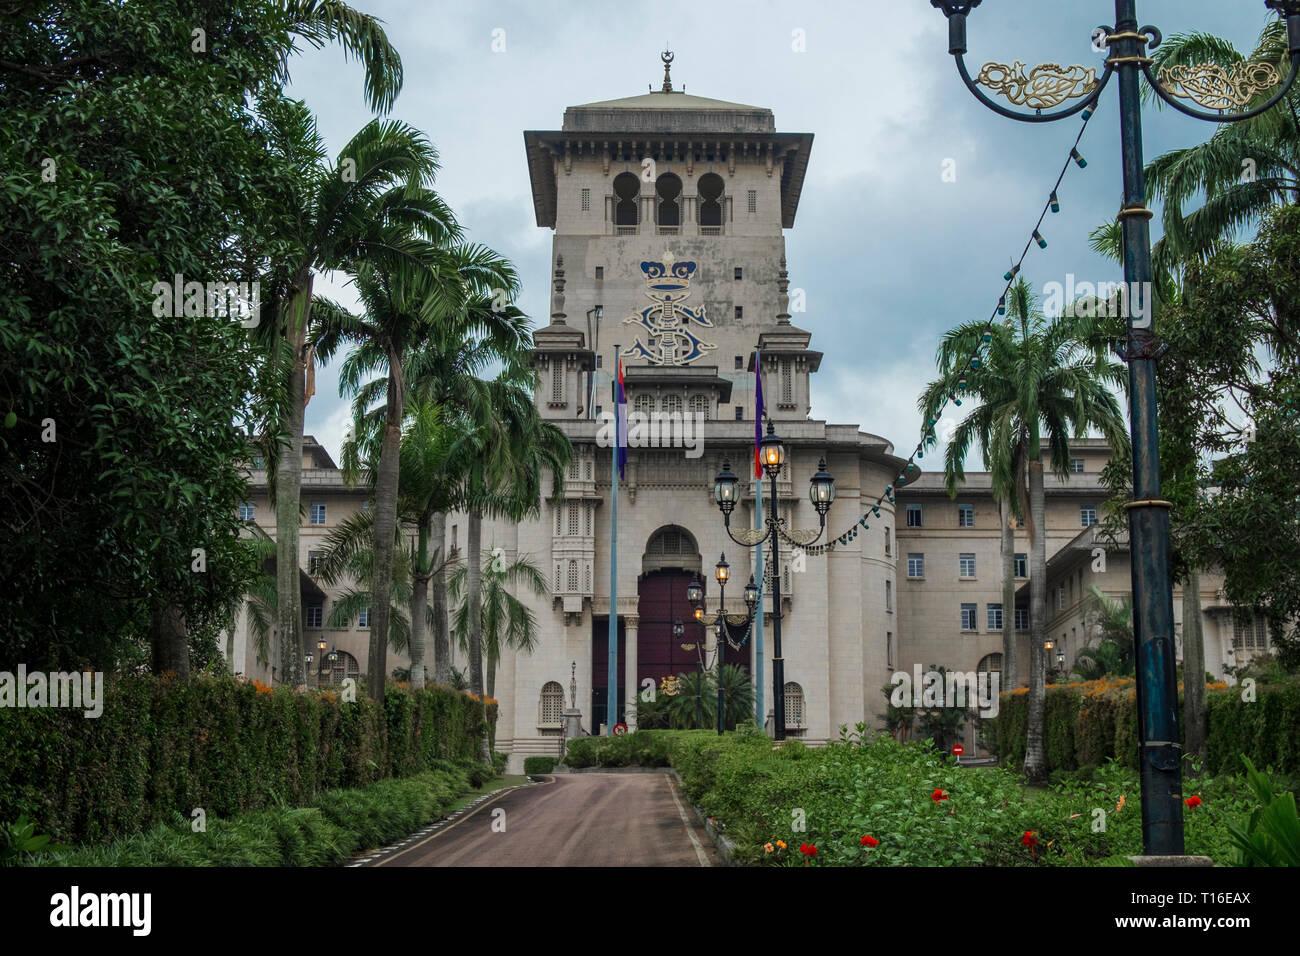 Exterior of the looming Bangunan Sultan Ibrahim government building